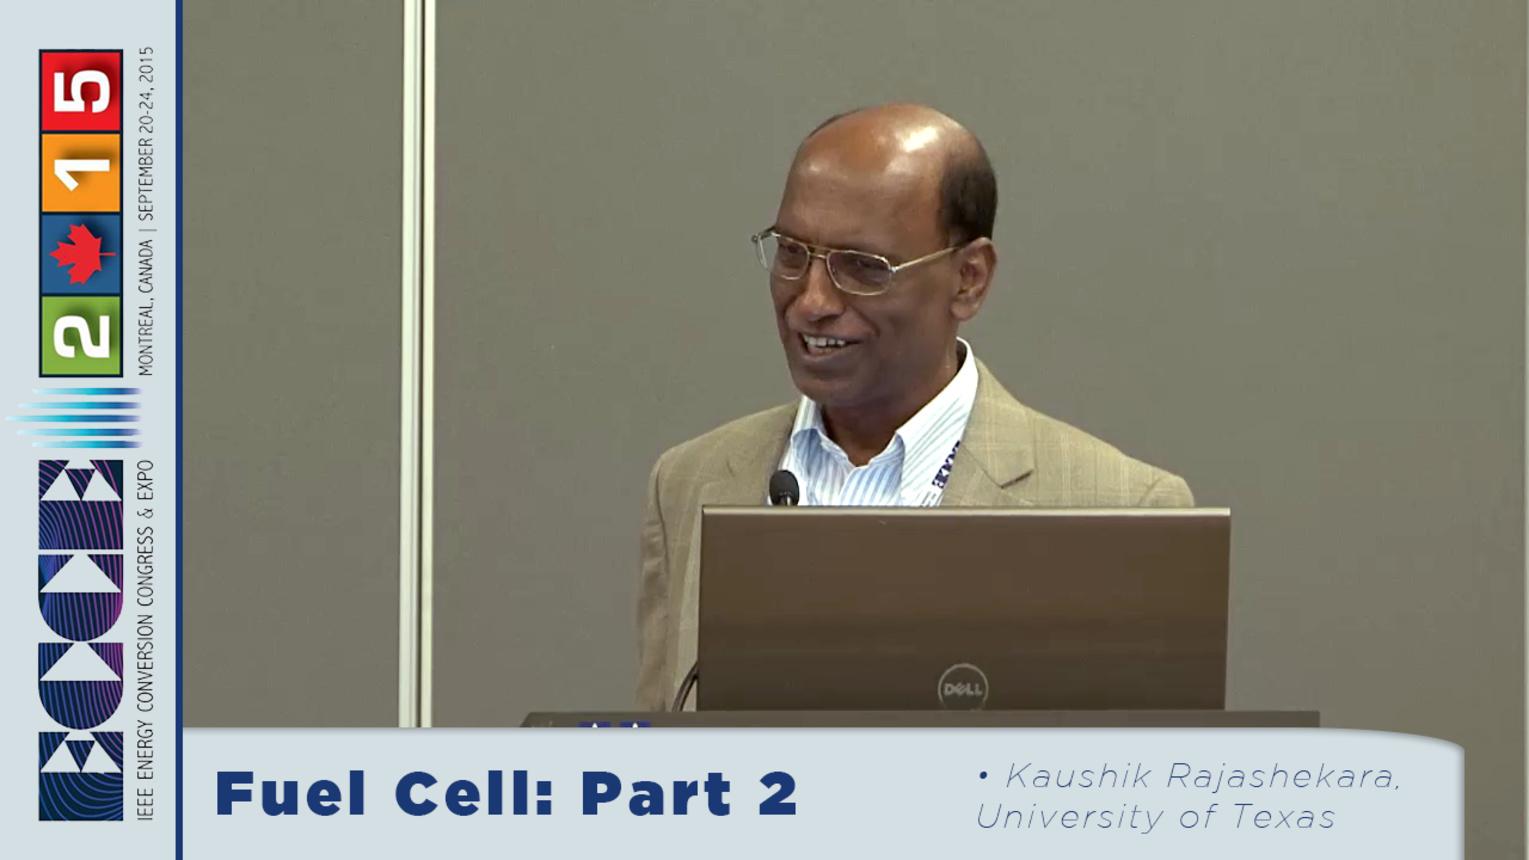 ECCE 2015 Fuel Cell Tutorial (Part 2) with Kaushik Rajashekara